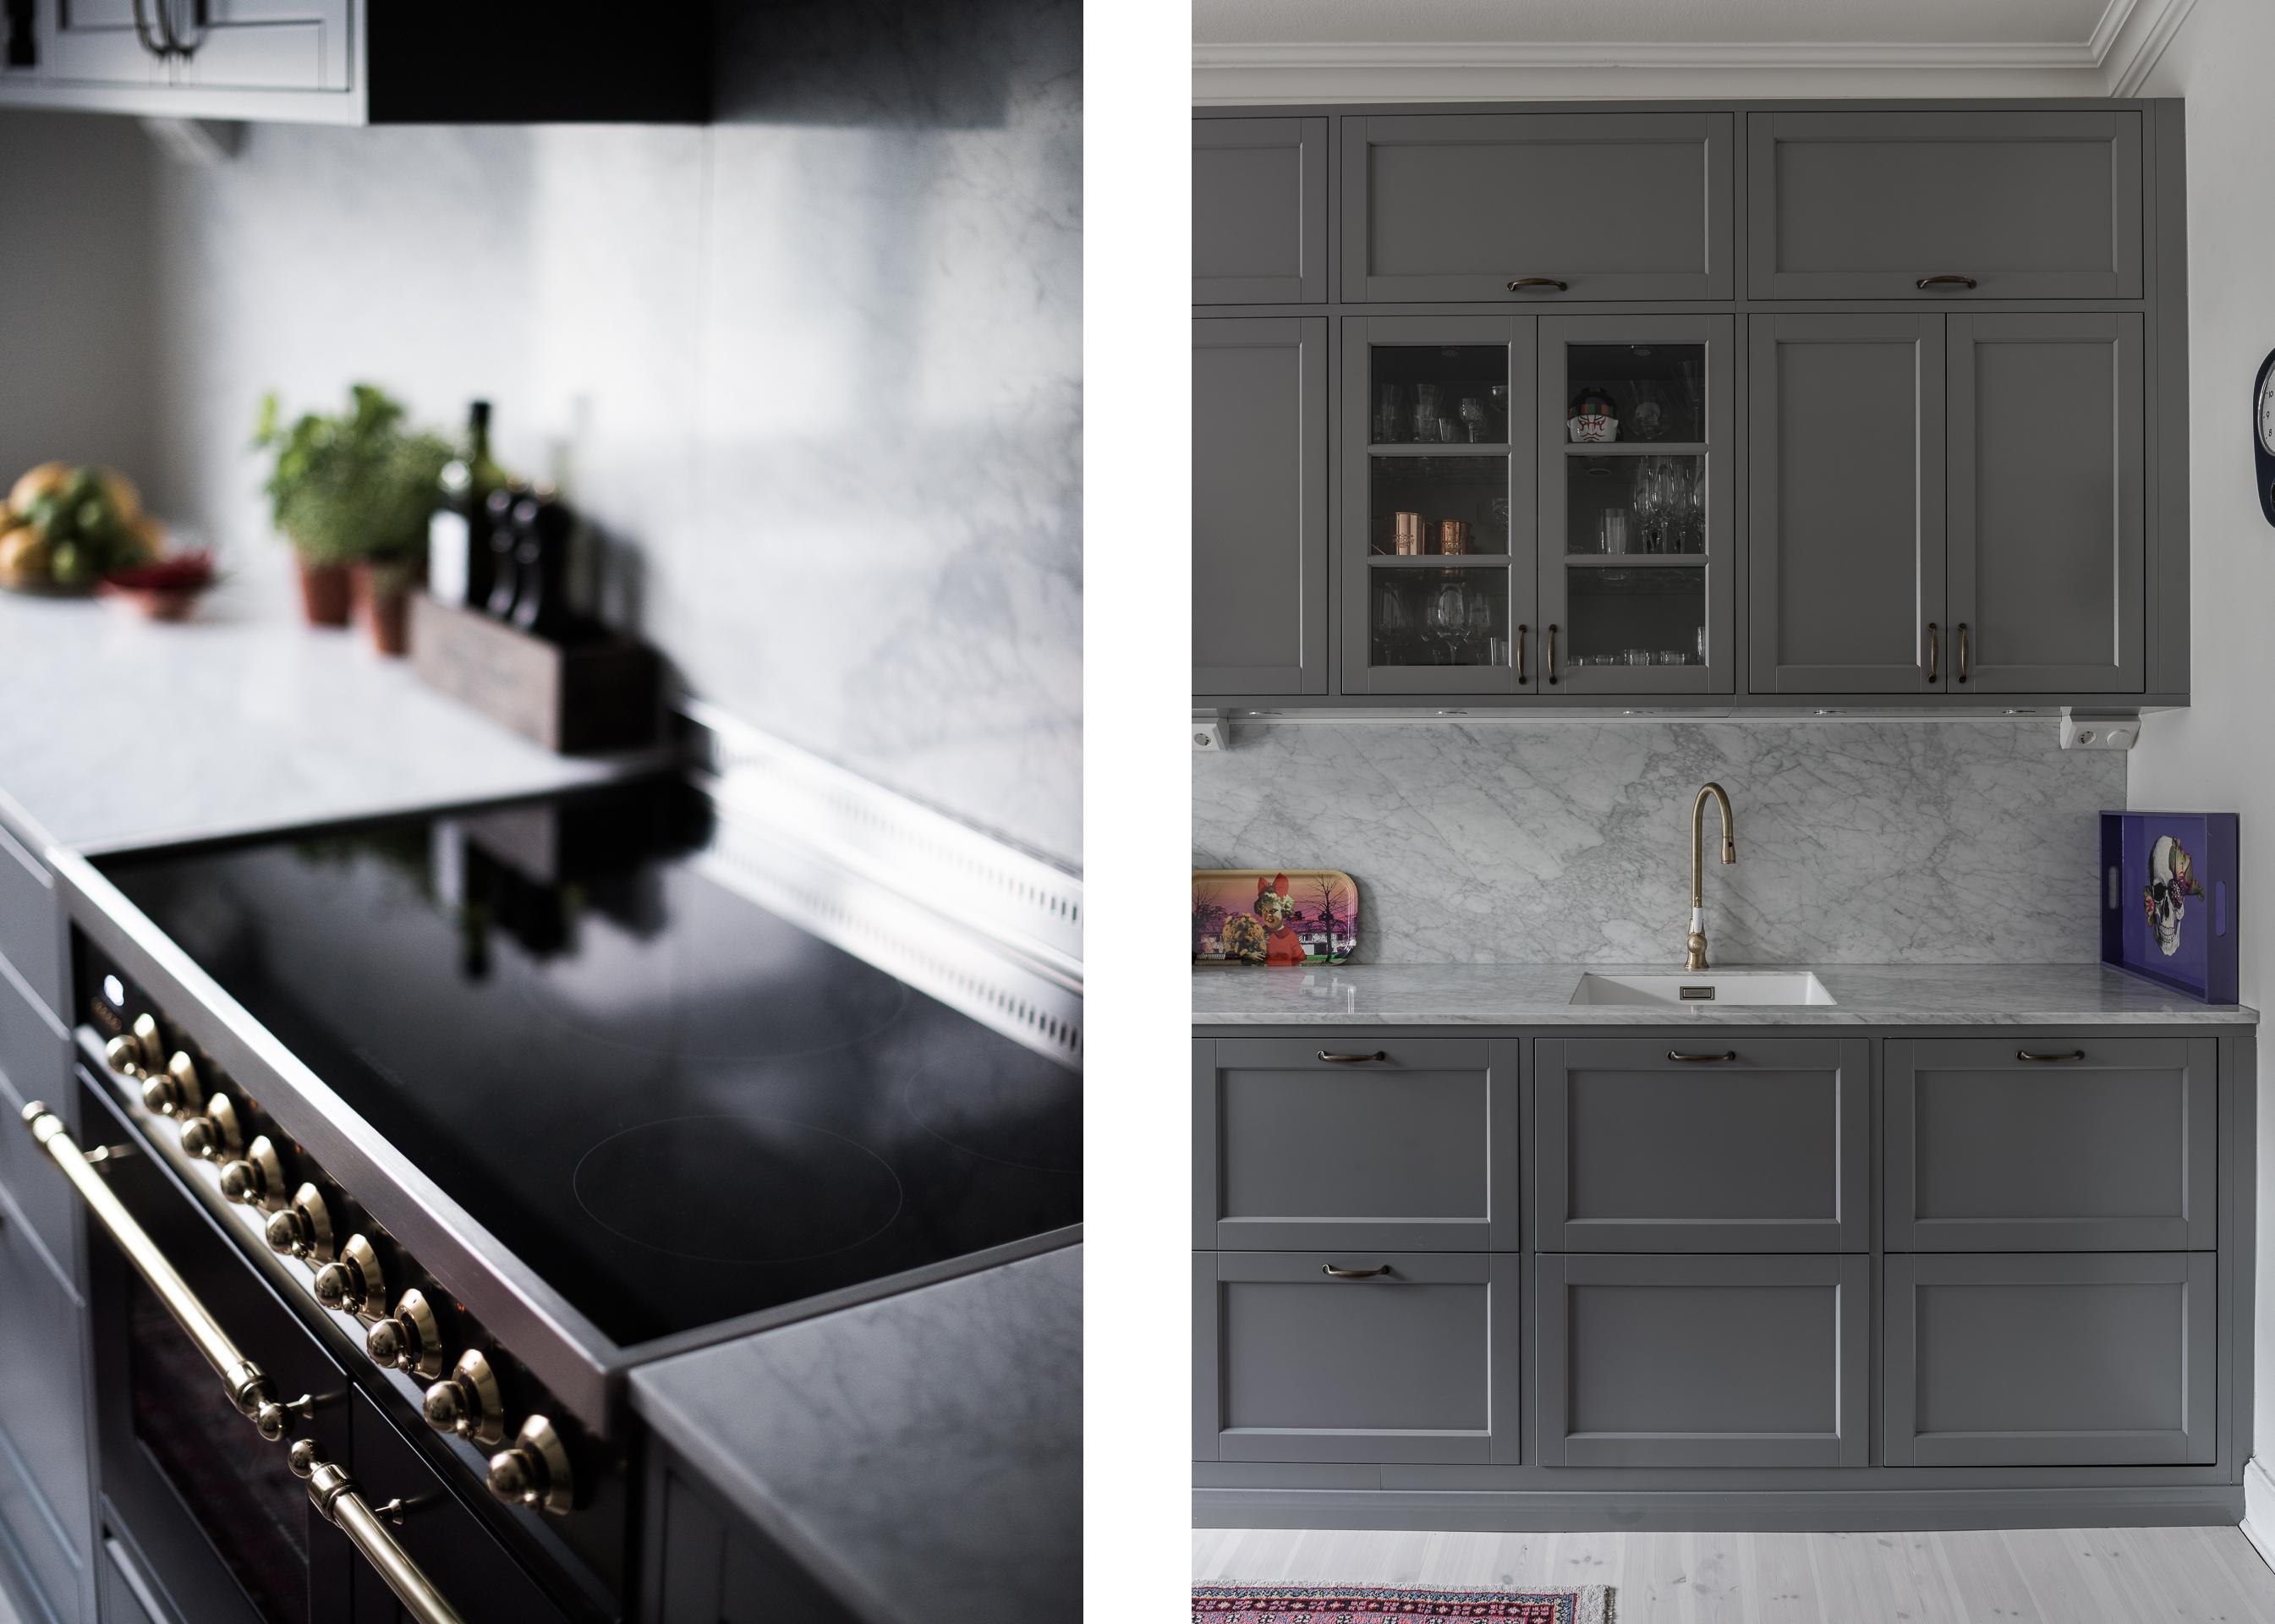 кухонная мебель серые фасады мраморная столешница фартук индукционная плита